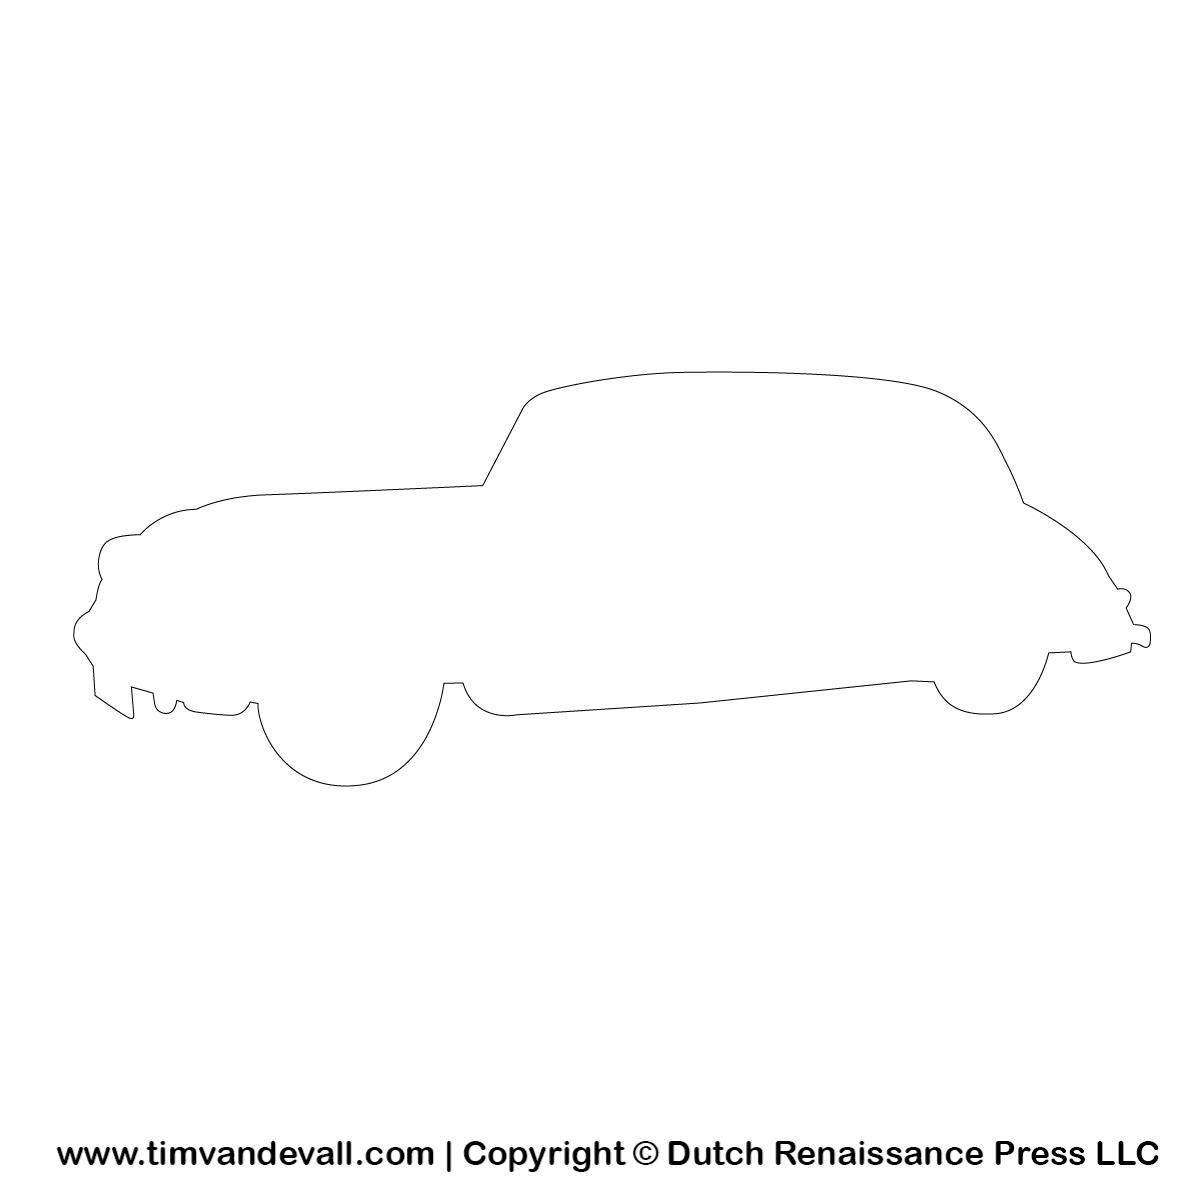 Automobile Silhouette Stencil Automobile Outline Clipart